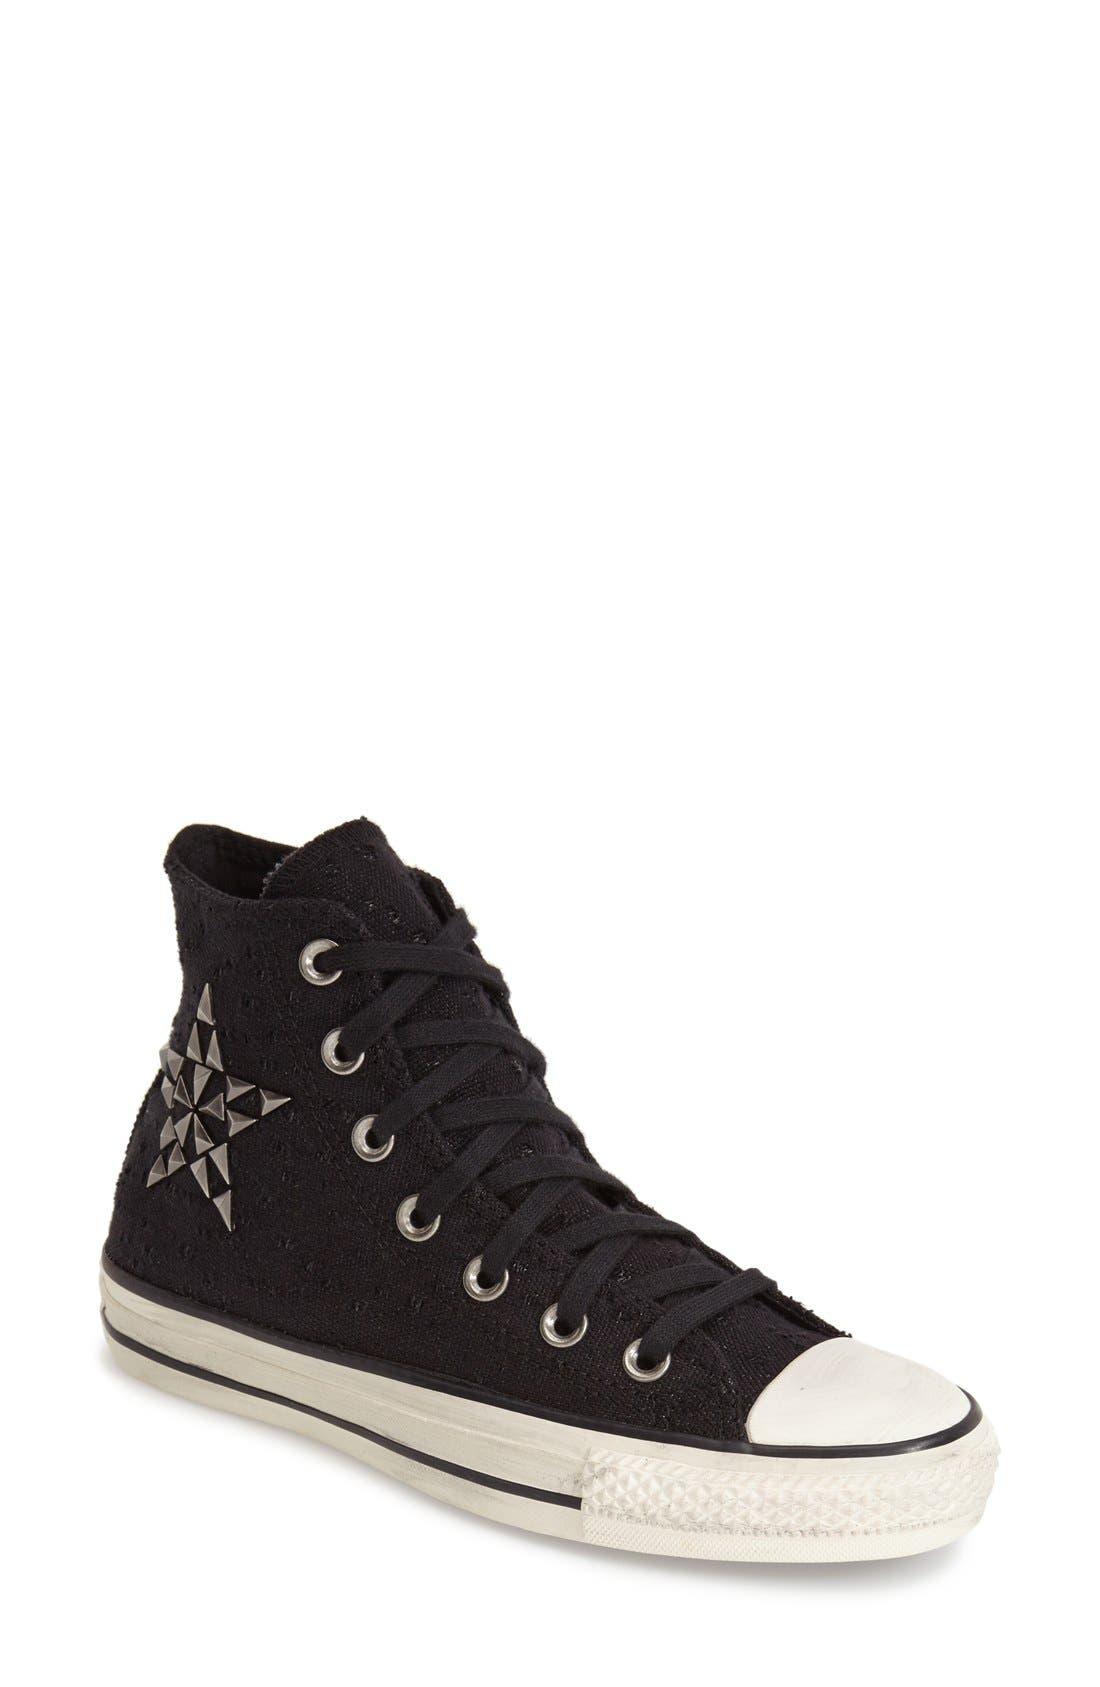 Main Image - Converse Chuck Taylor® All Star® 'Star Hardware' High Top Sneaker (Women)